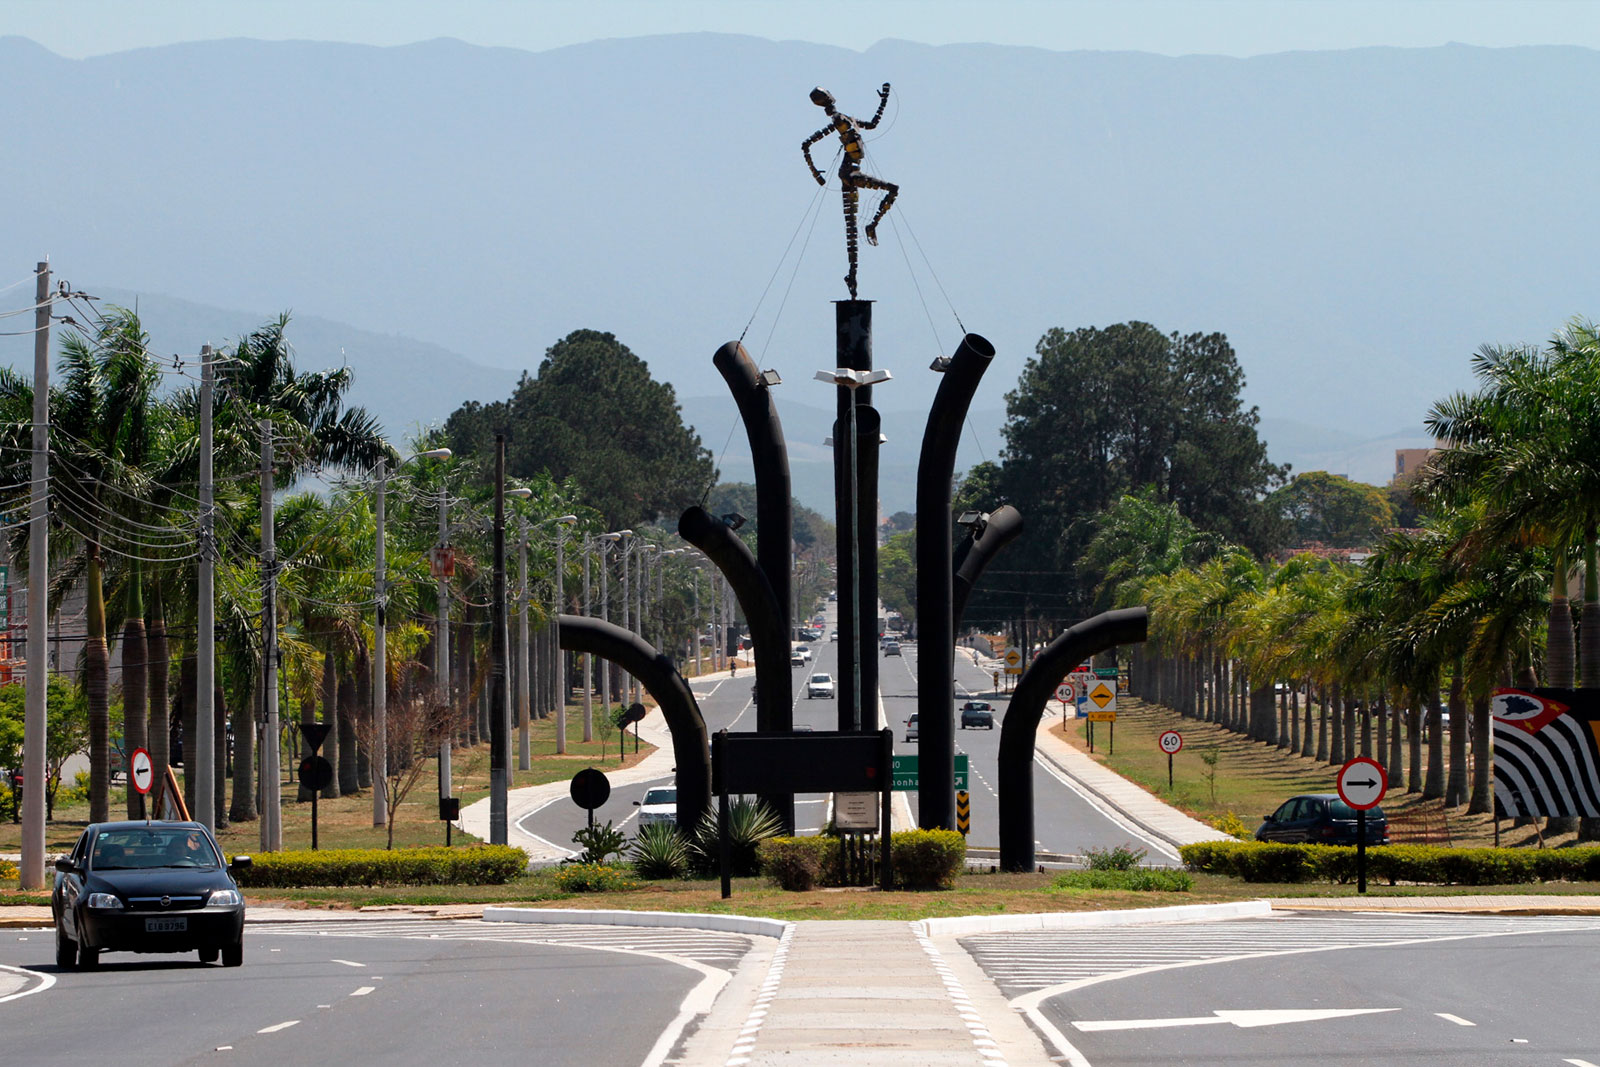 pindamonhangaba - Nossa Região